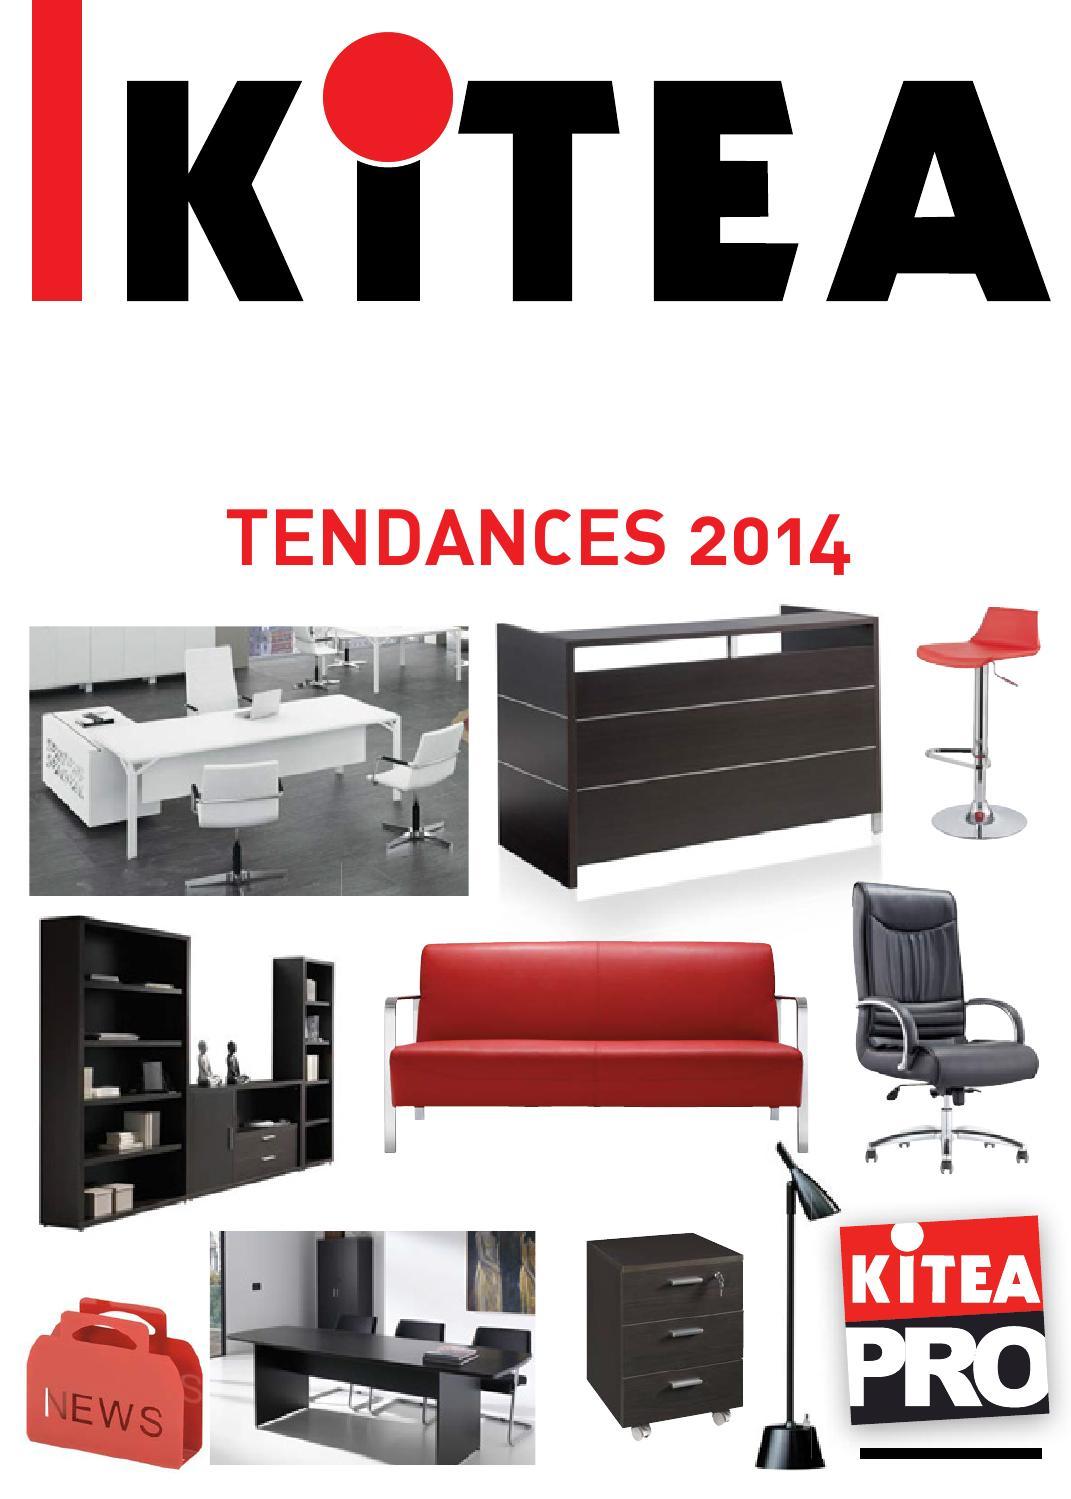 Catalogue kitea maroc pro tendances 2014 by promotionmaroc for Bureau kitea